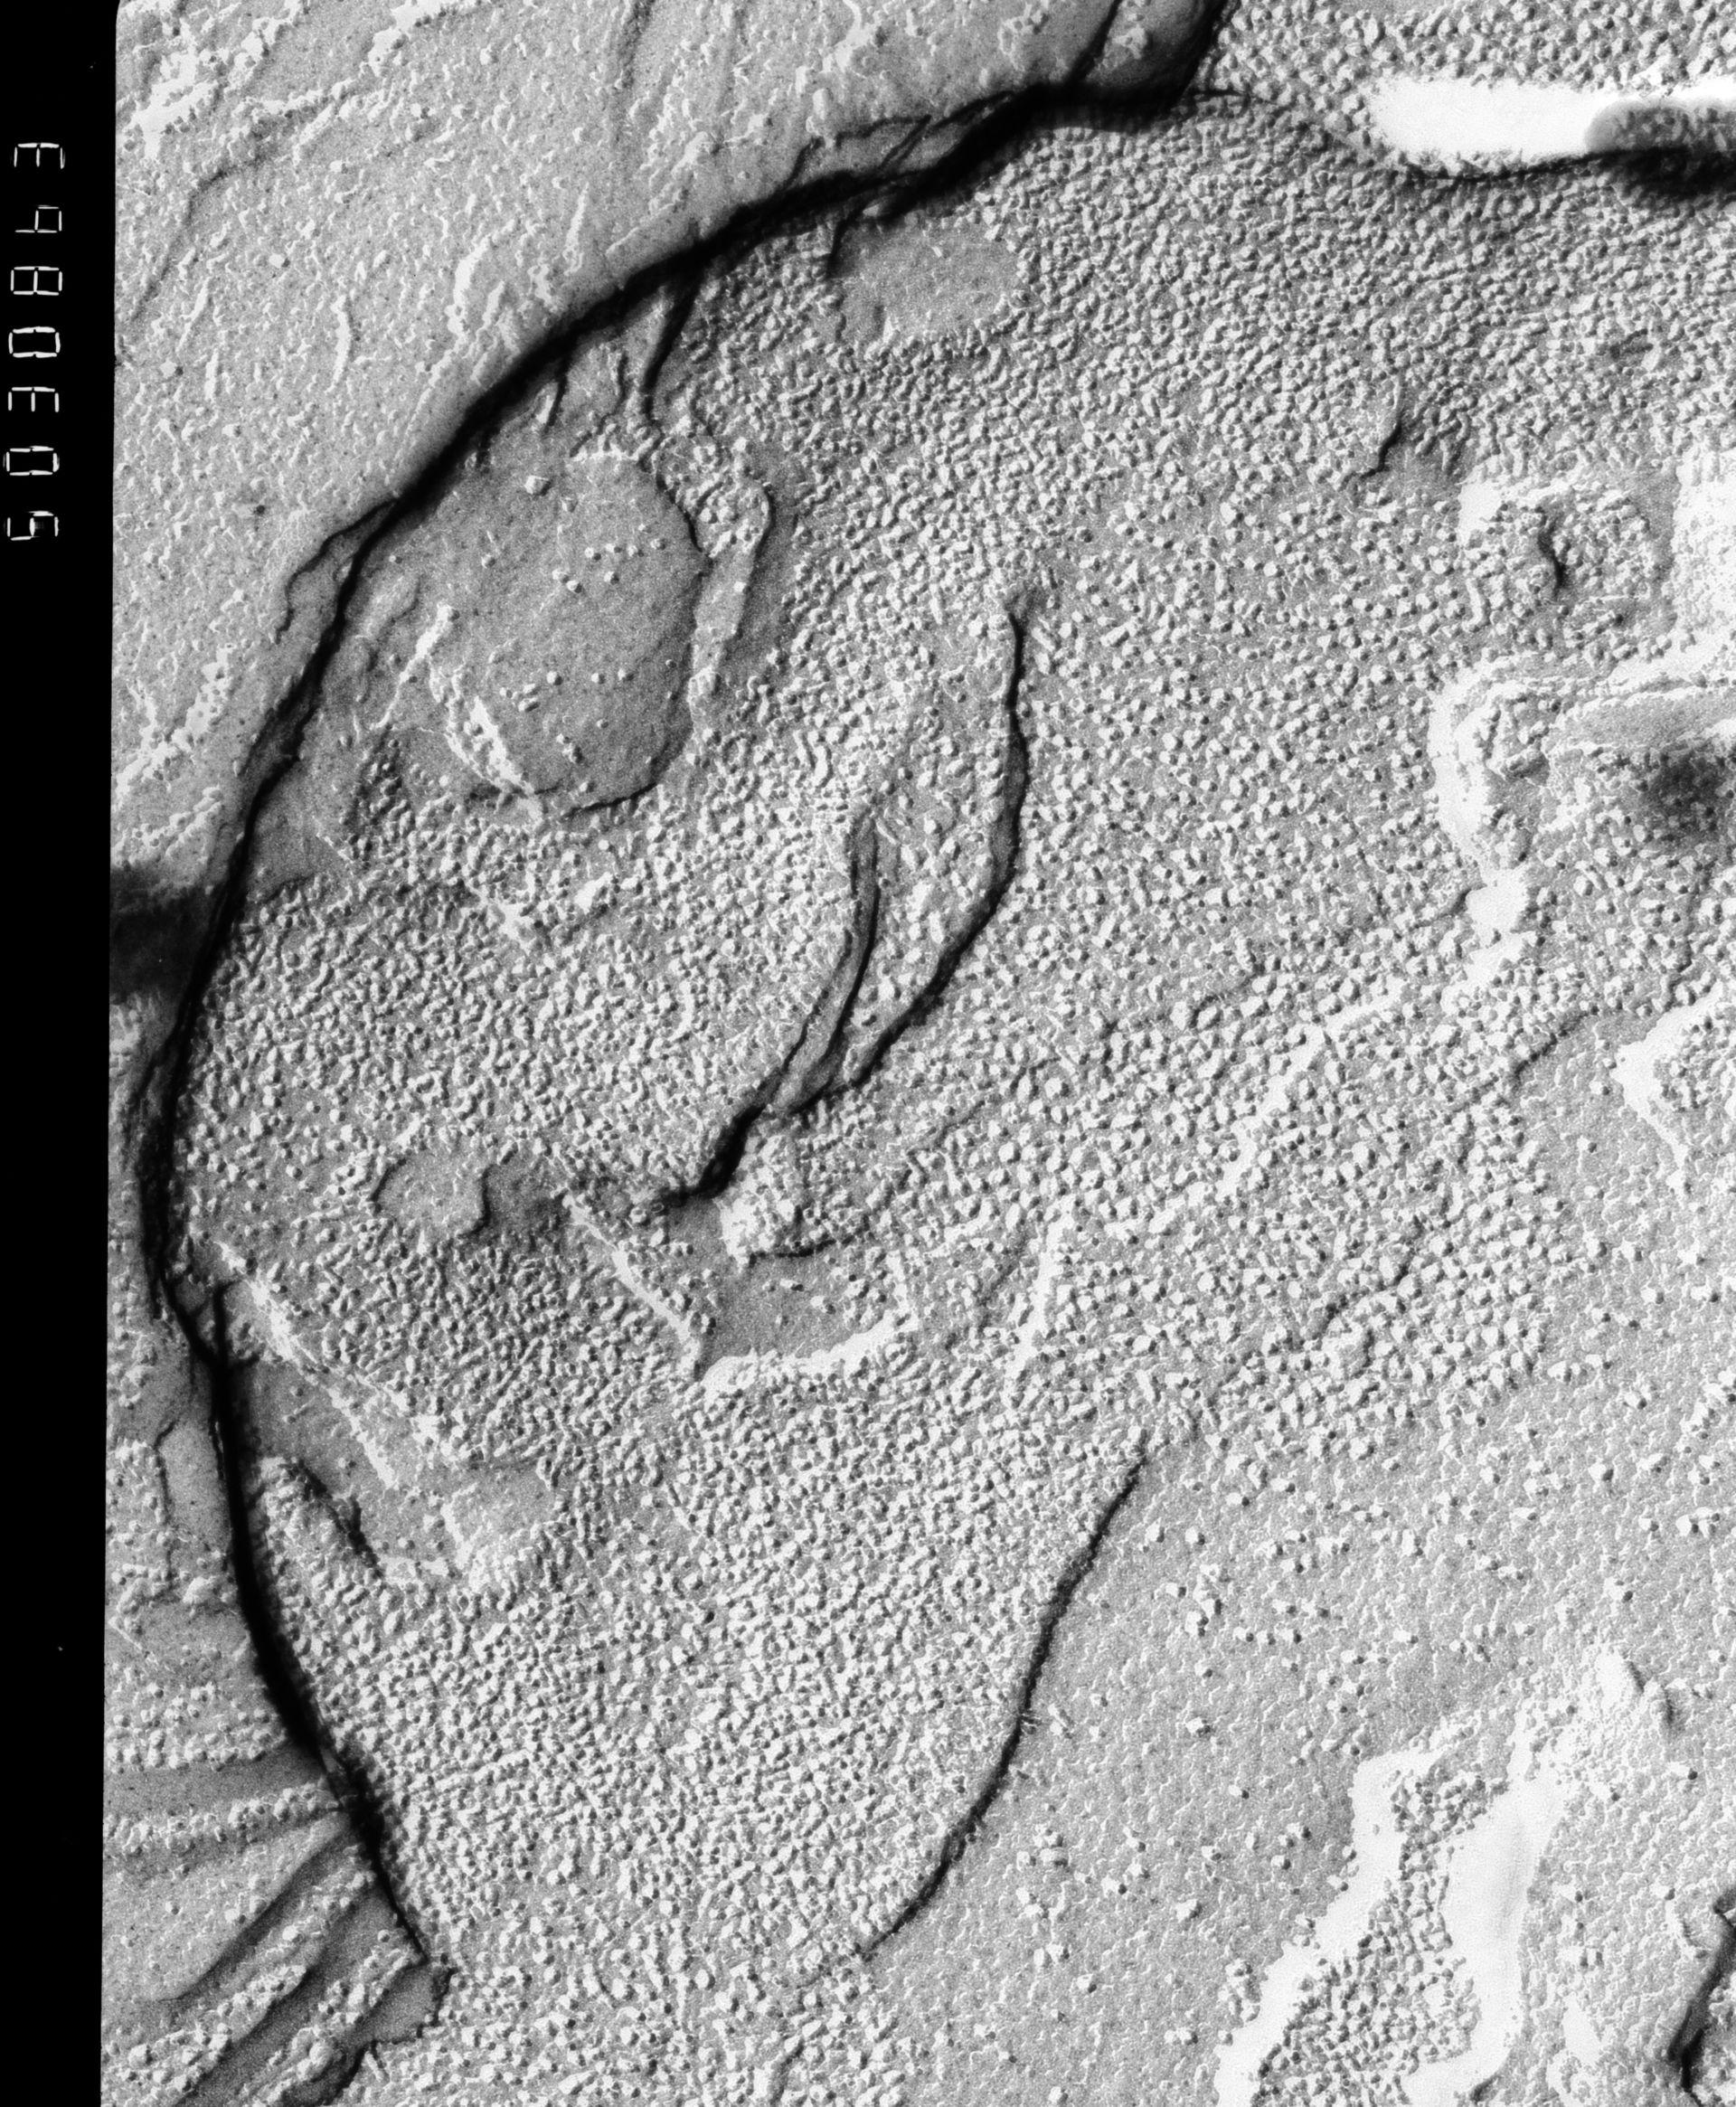 Prochloron (Thylakoid) - CIL:13995